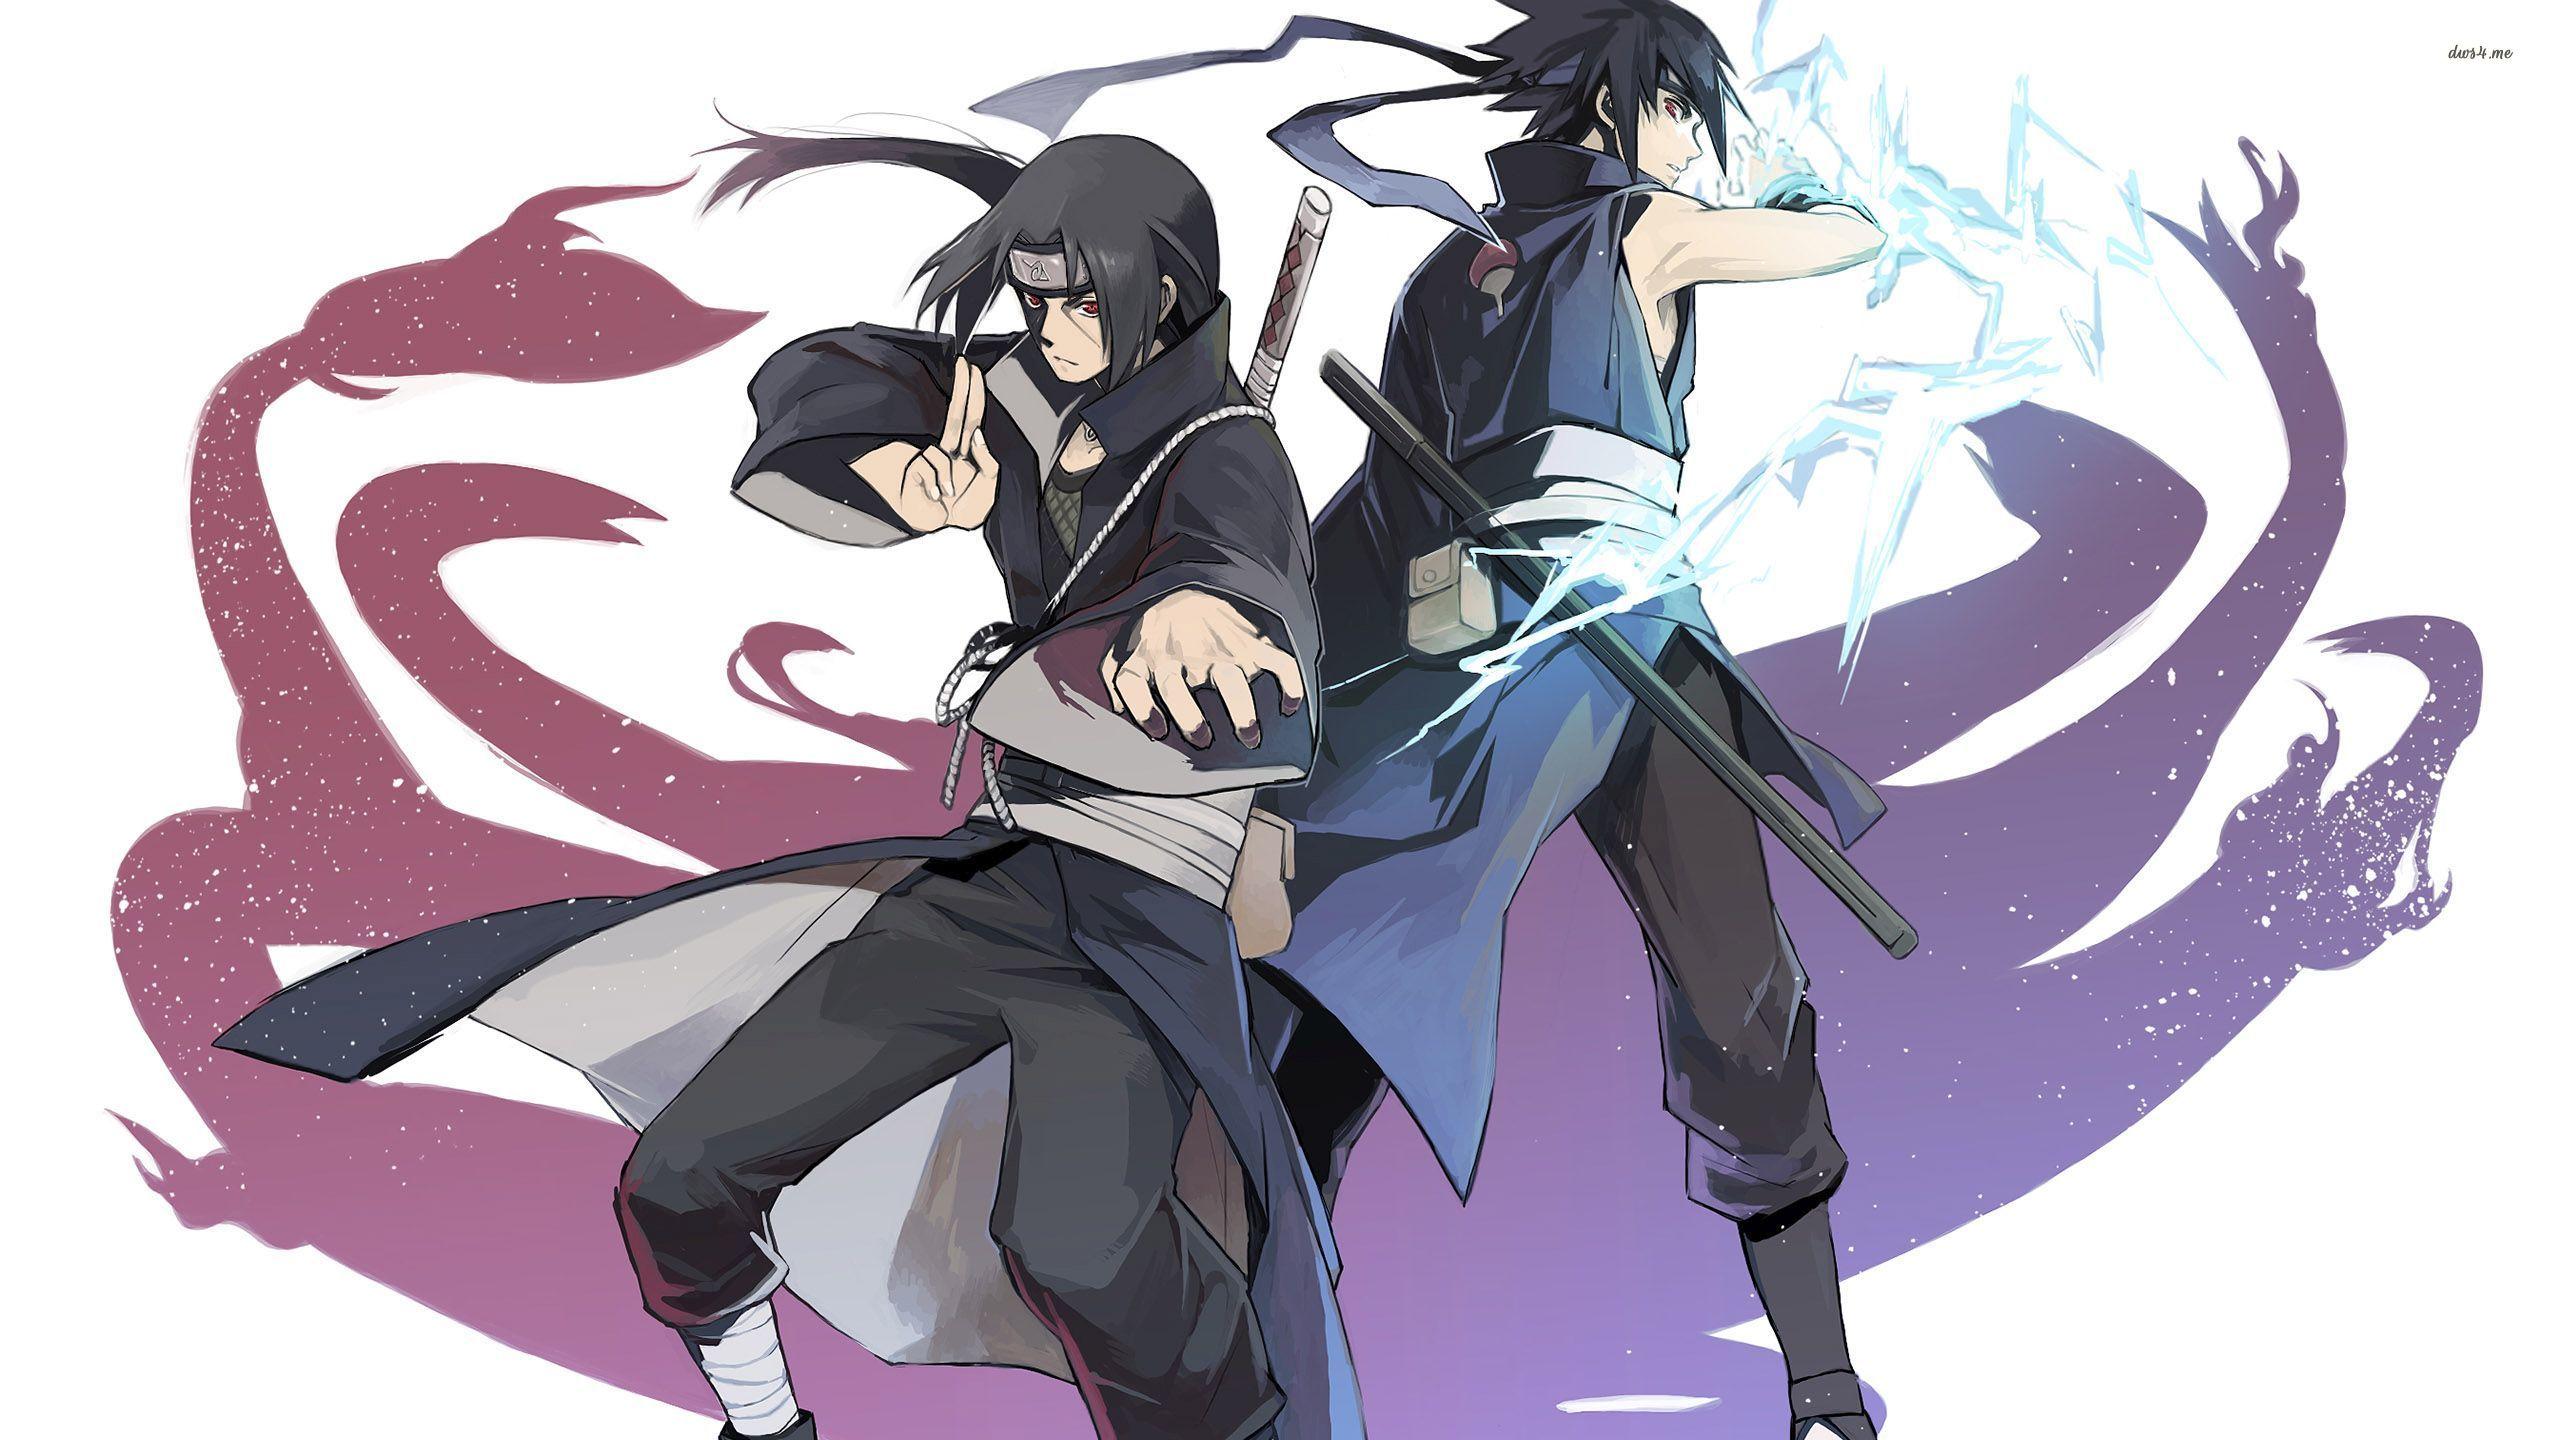 Naruto Shisui And Itachi Itachi Wallpaper Sasuke Hd 2560x1440 Download Hd Wallpaper Wallpapertip